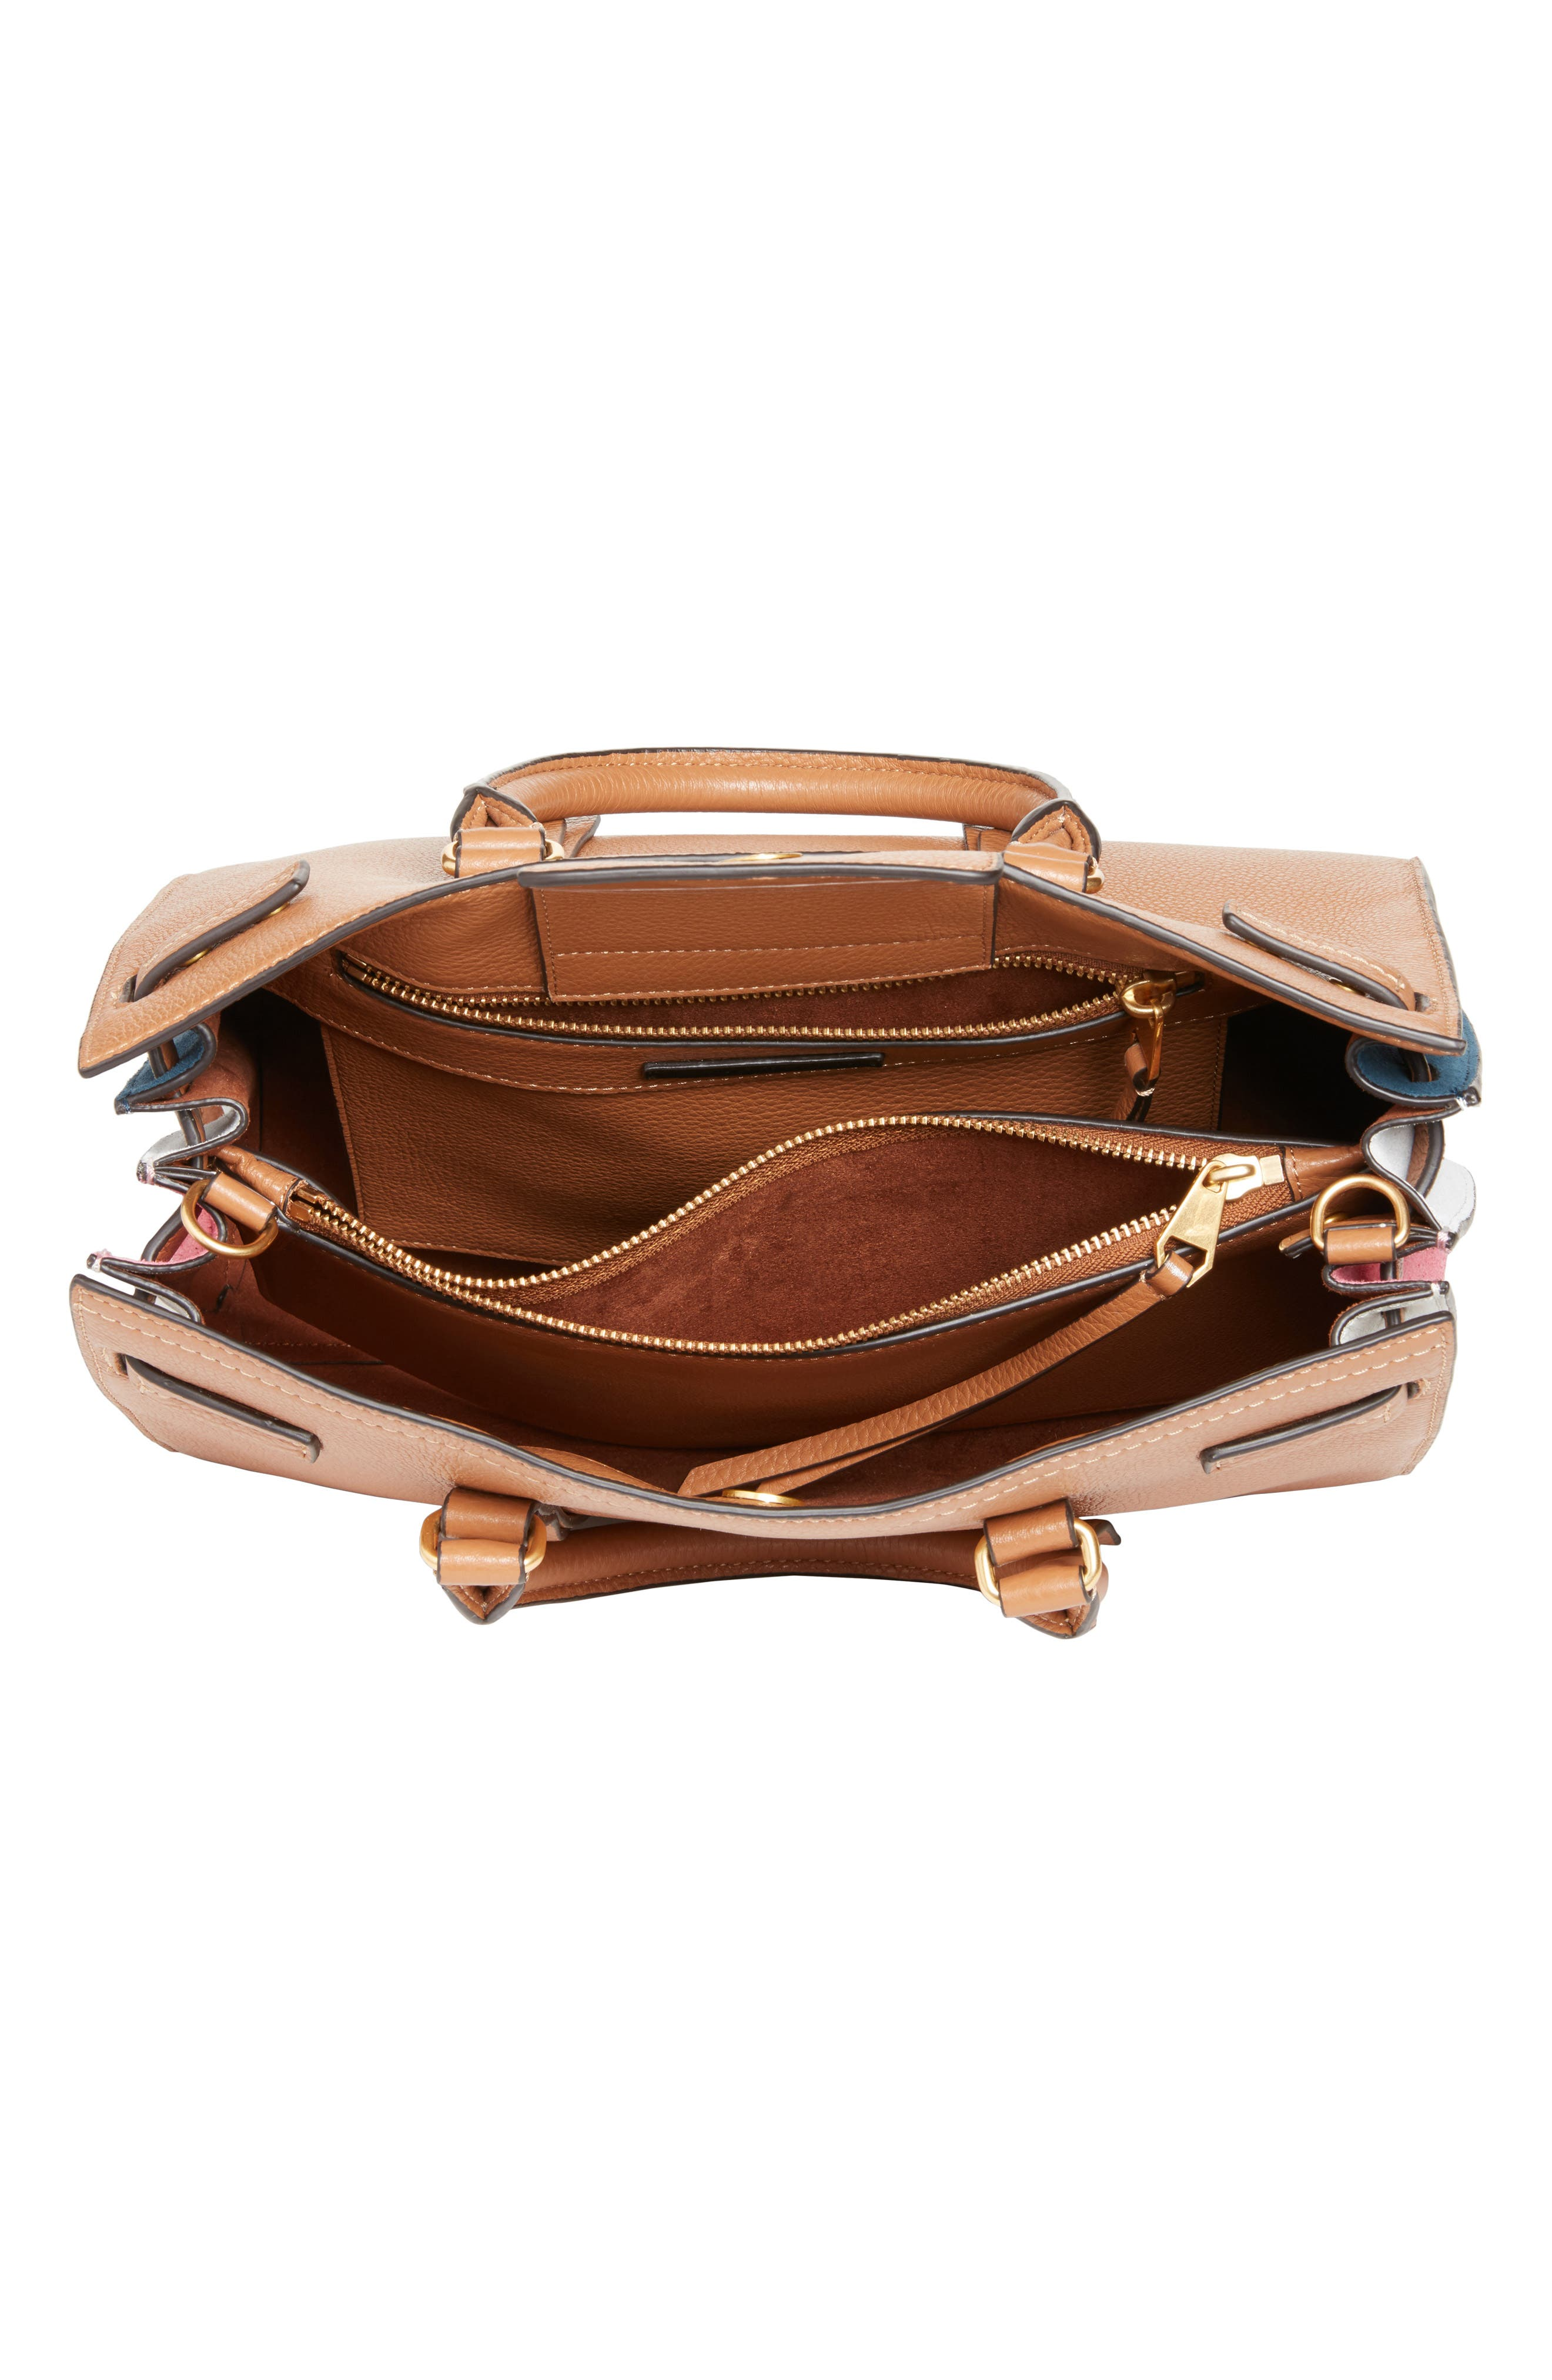 Sherry Calfskin Leather Satchel,                             Alternate thumbnail 4, color,                             Almond Multi